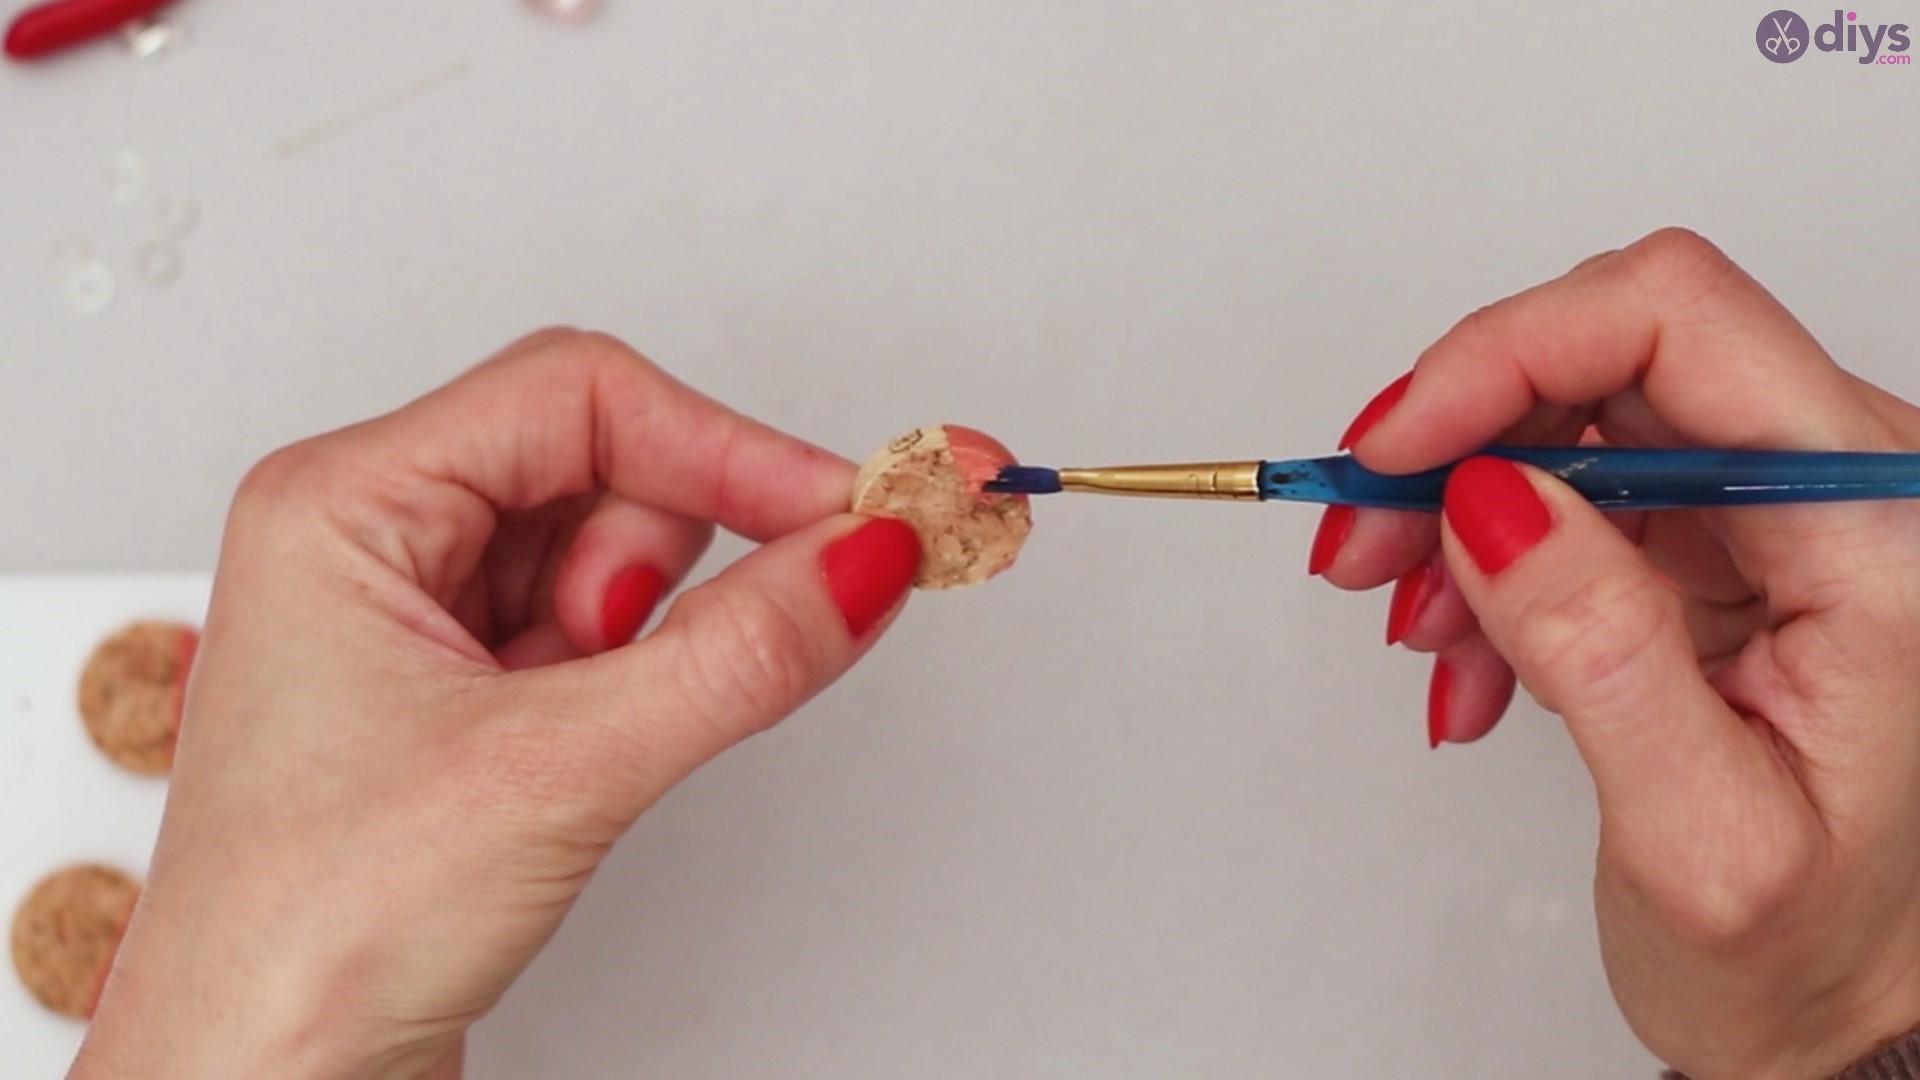 Diy wine cork necklace (8)